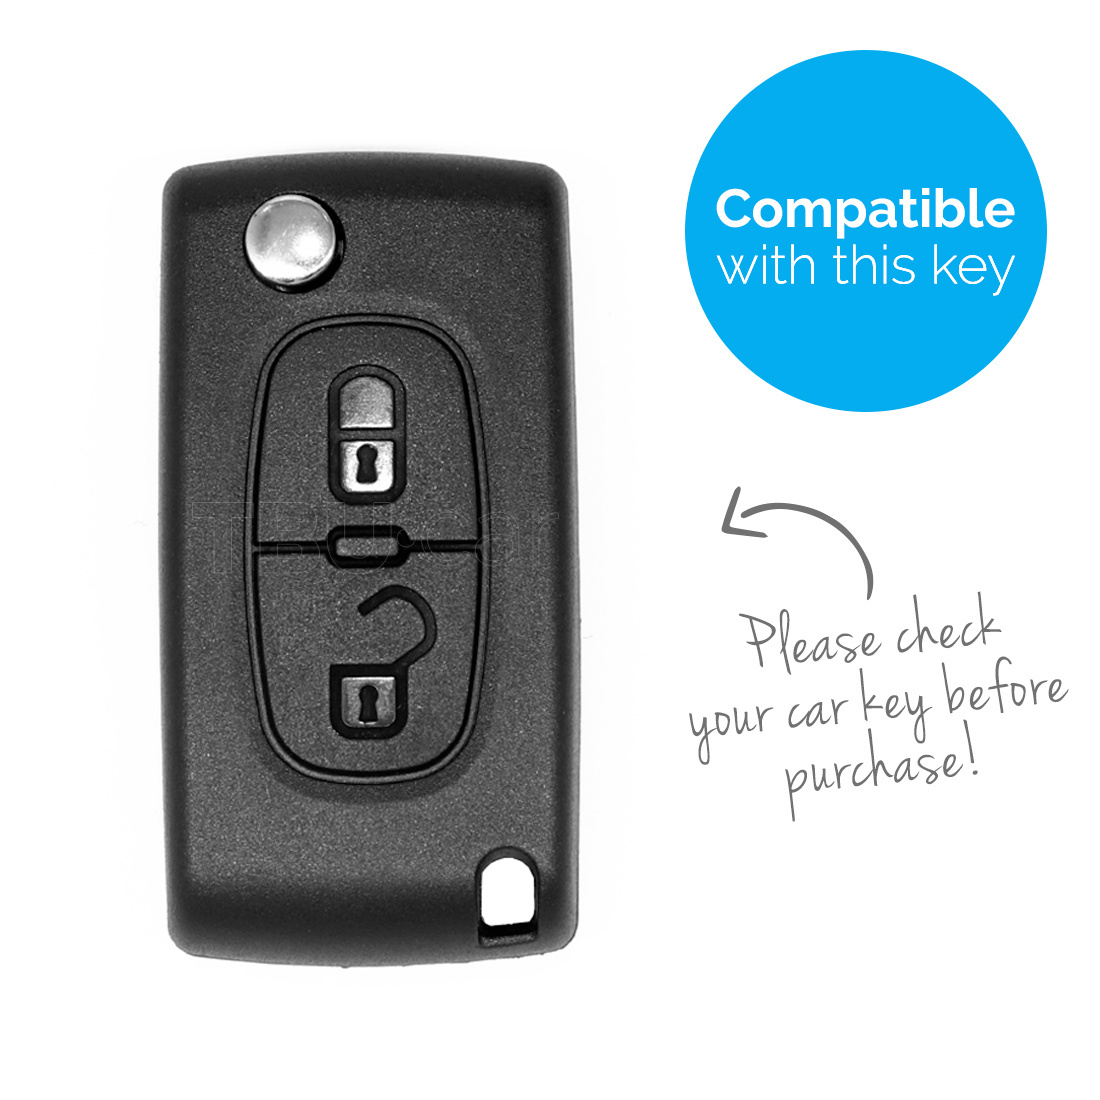 TBU car TBU car Autoschlüssel Hülle kompatibel mit Peugeot 2 Tasten - Schutzhülle aus Silikon - Auto Schlüsselhülle Cover in Im Dunkeln leuchten